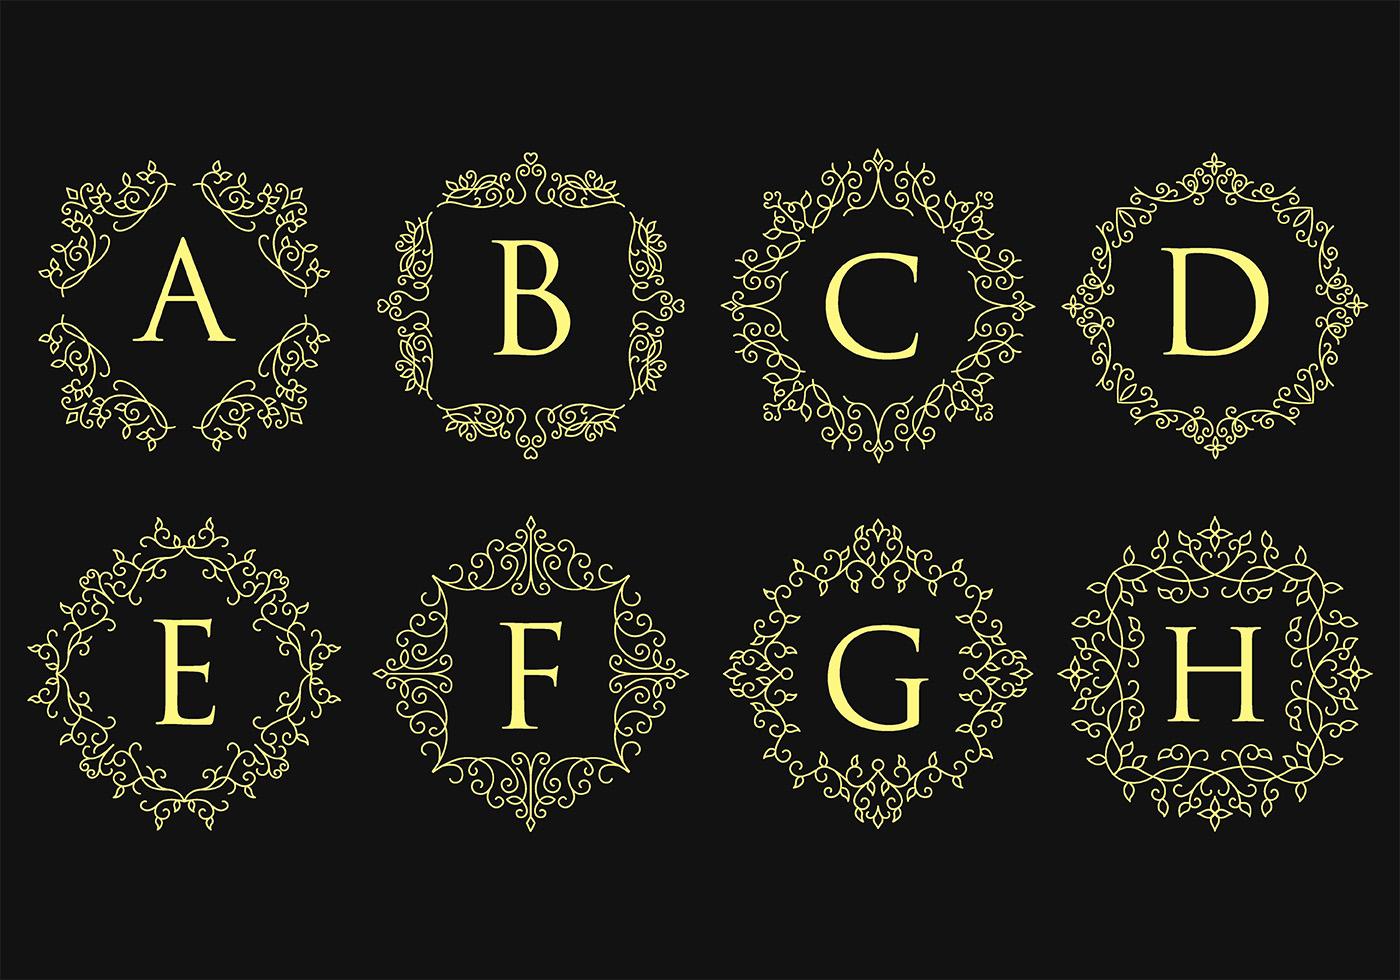 Monograms Free Vector Art - (14,181 Free Downloads)